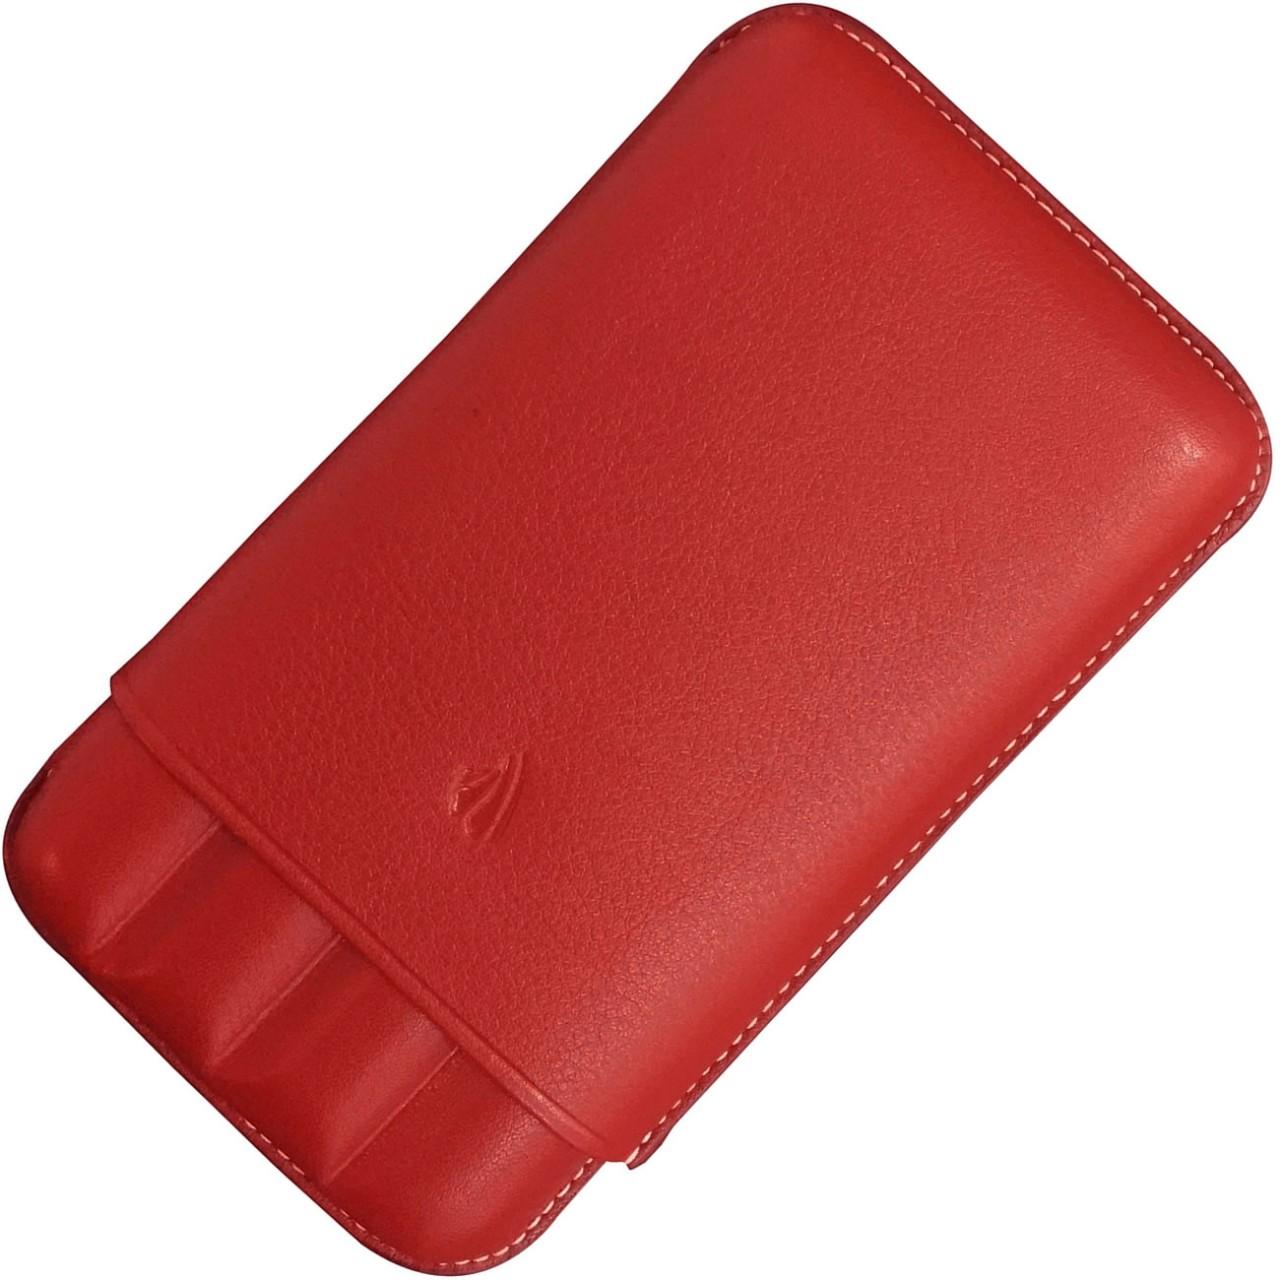 COLLECTOR 4-PEN CASE * RIVIERA RED